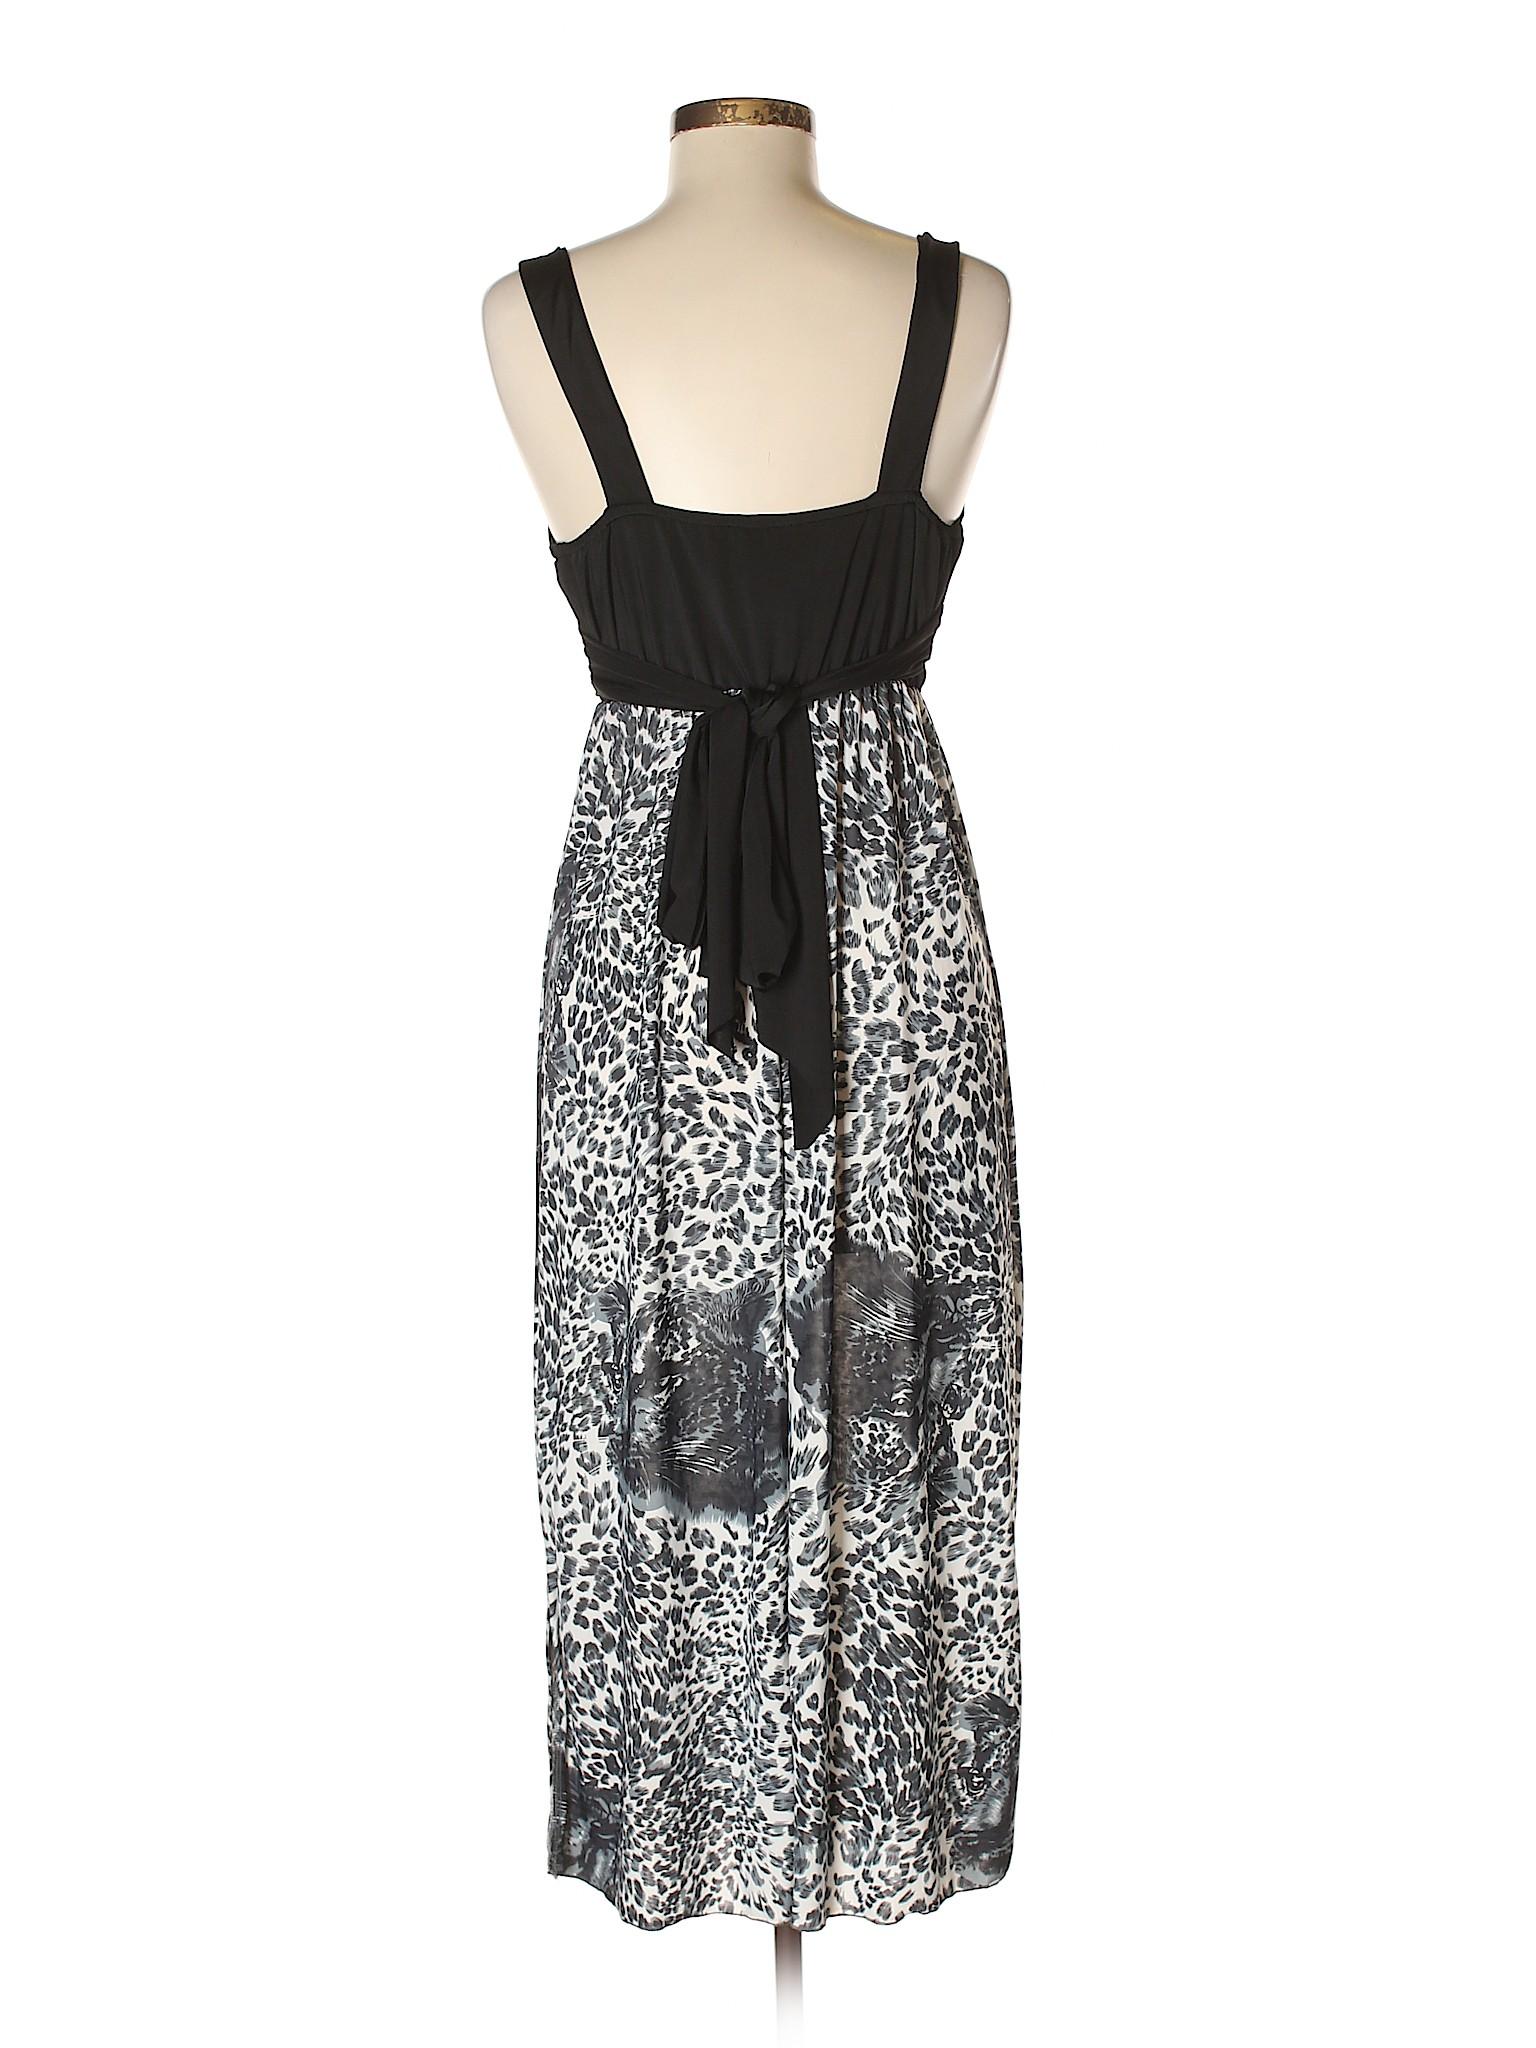 Casual California winter Woman Boutique Dress Bwfx0q6xng